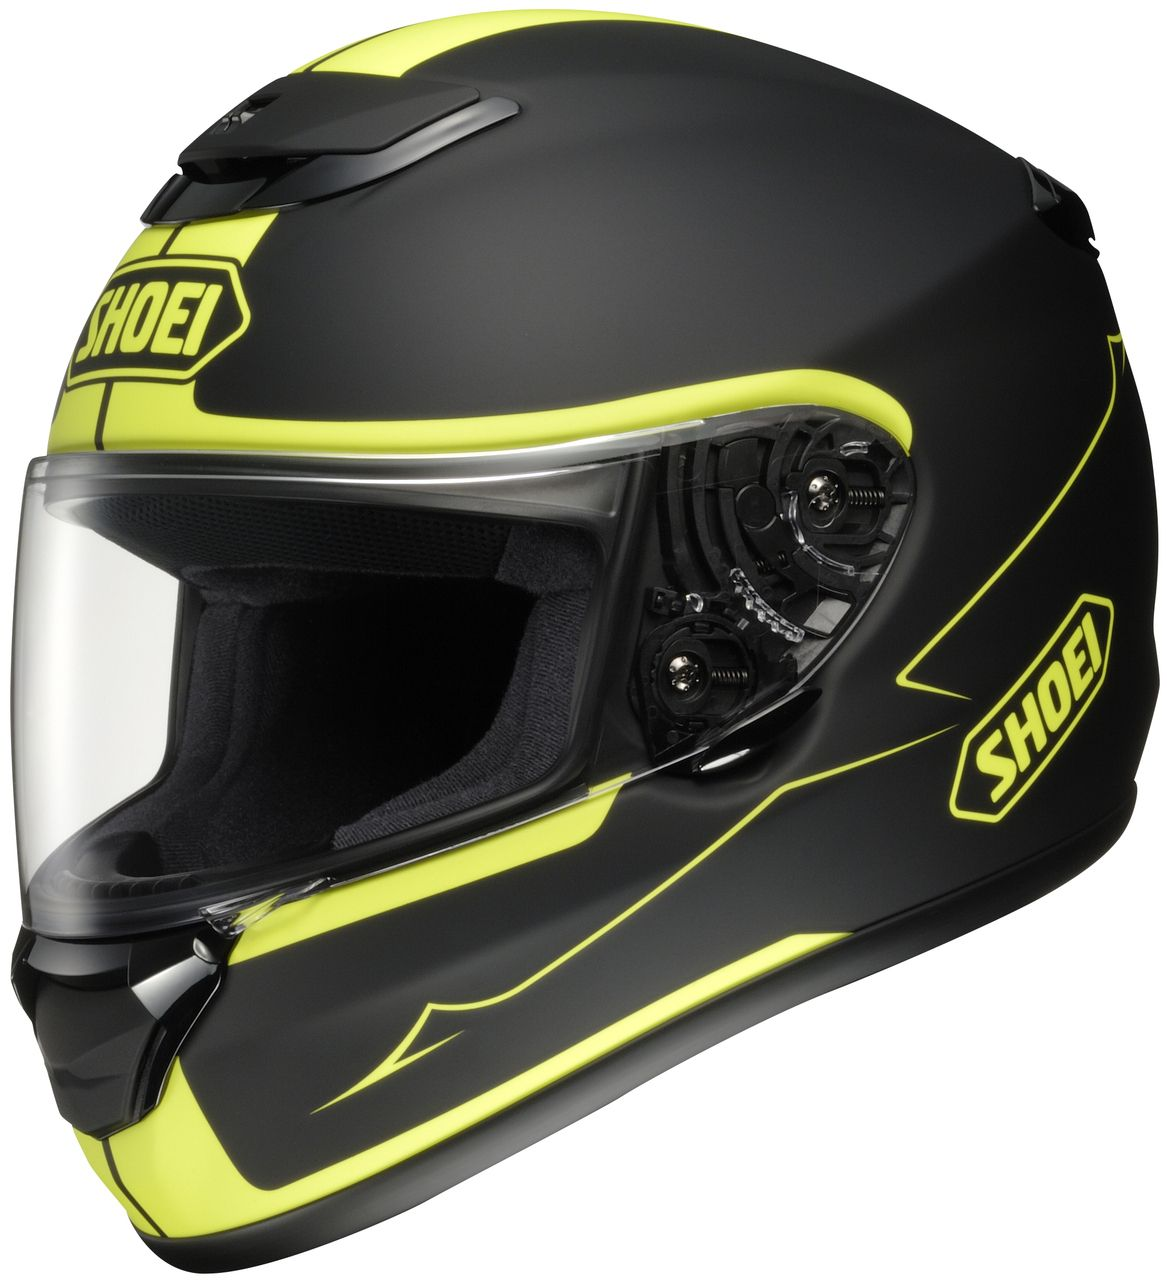 pin by helmet man on motorcycle helmets. Black Bedroom Furniture Sets. Home Design Ideas